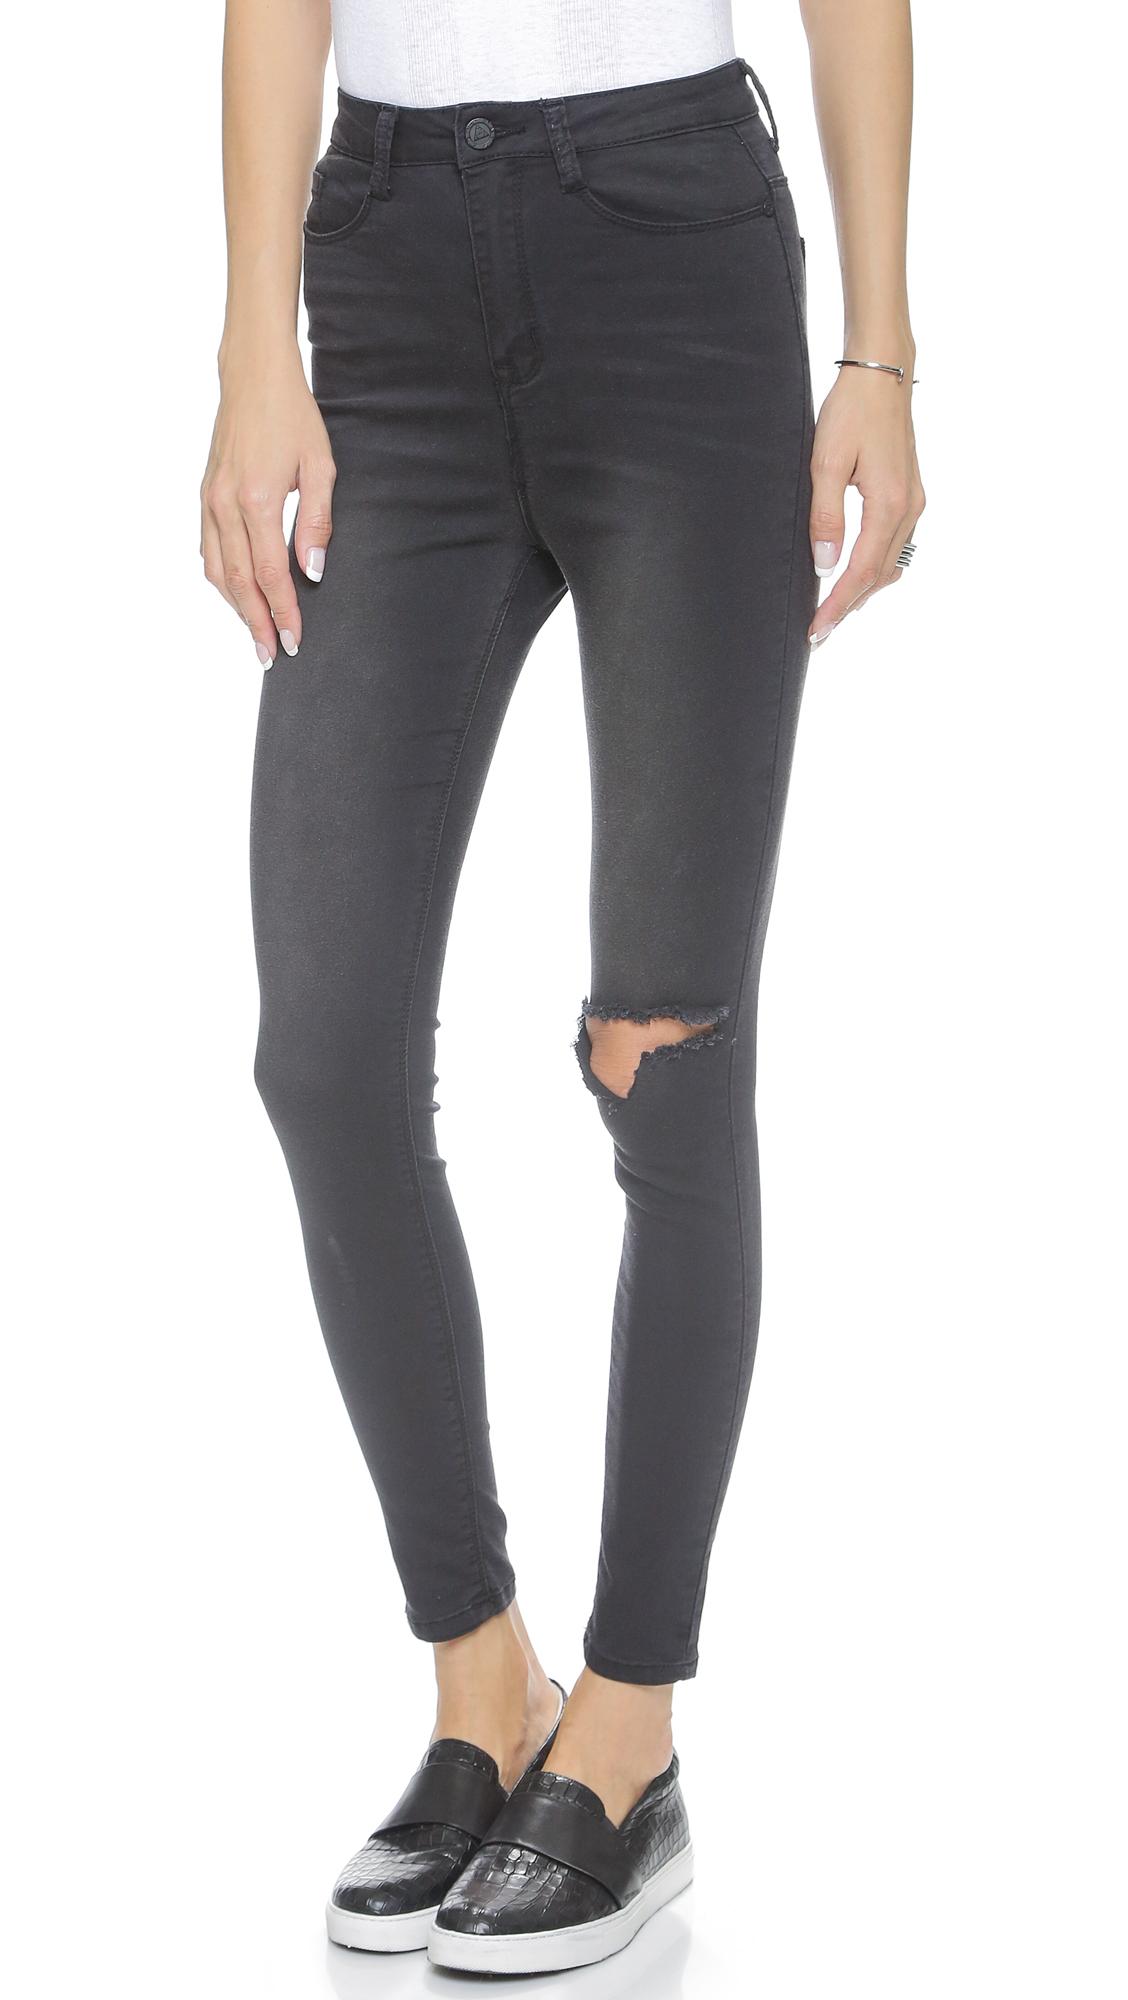 Lyst - Unif Via Jeans - Faded Black in Black